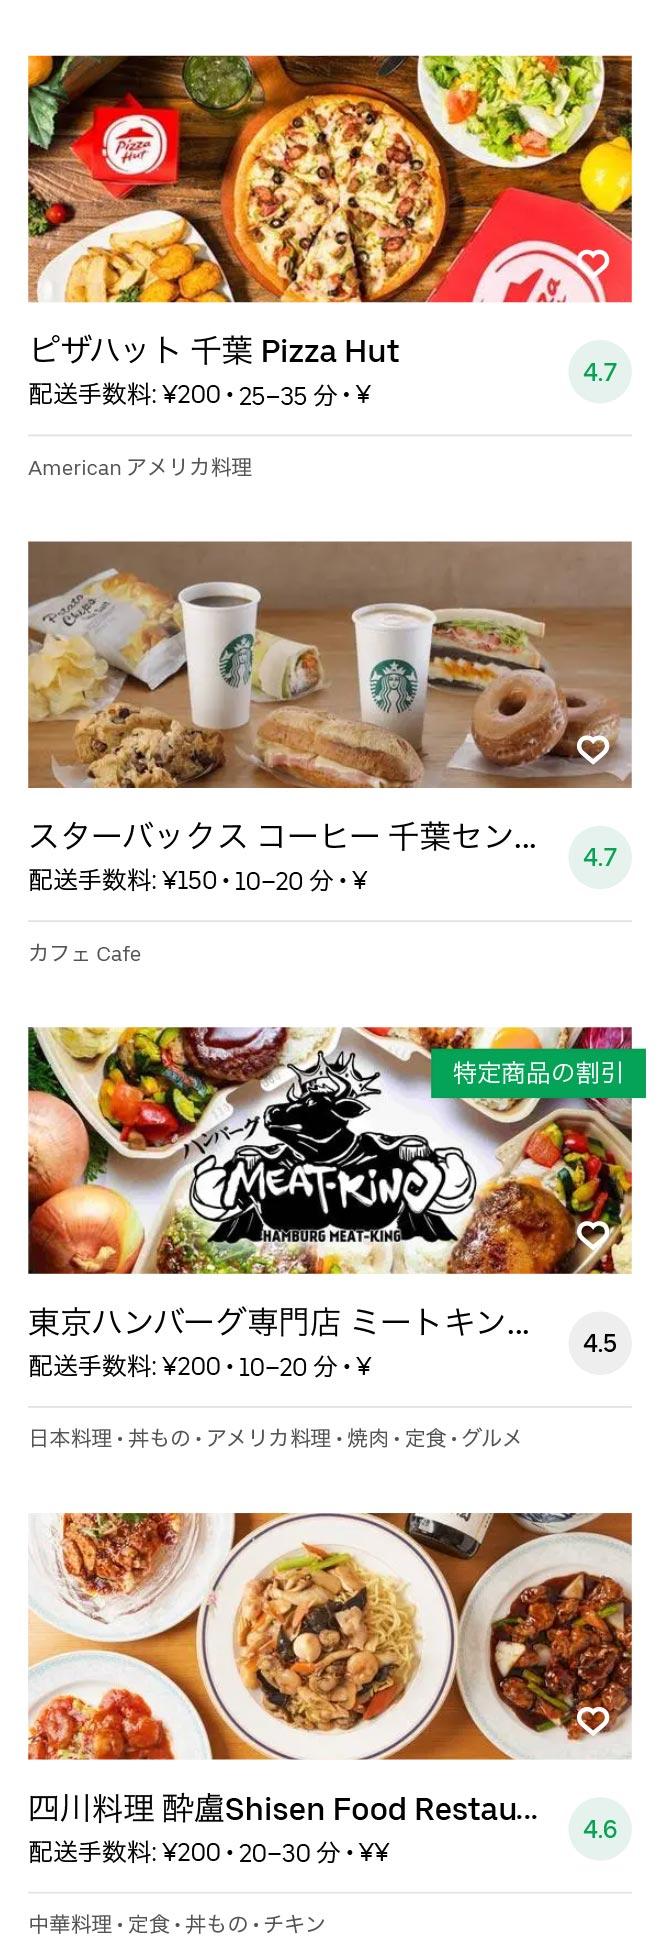 Chiba menu 2010 12